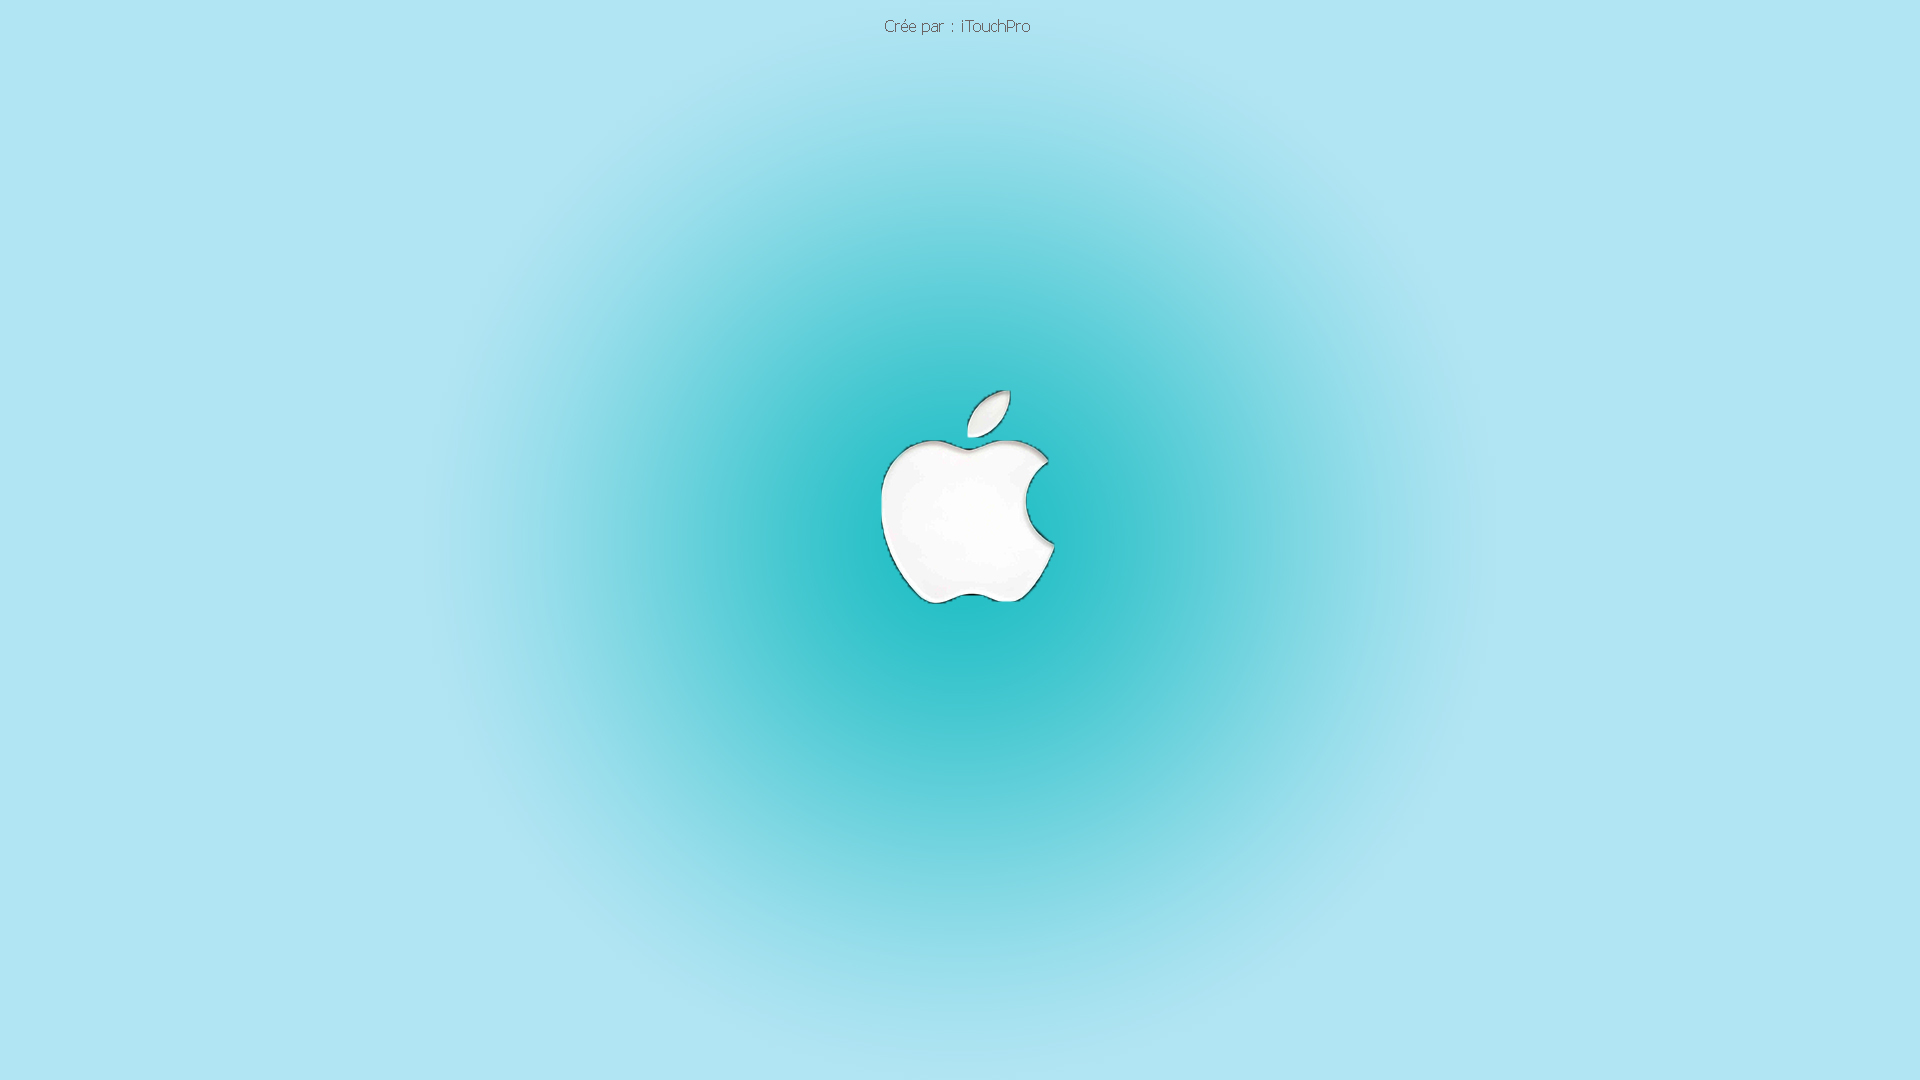 Free Download Apple Iphone 5 Default Wallpaper Blue